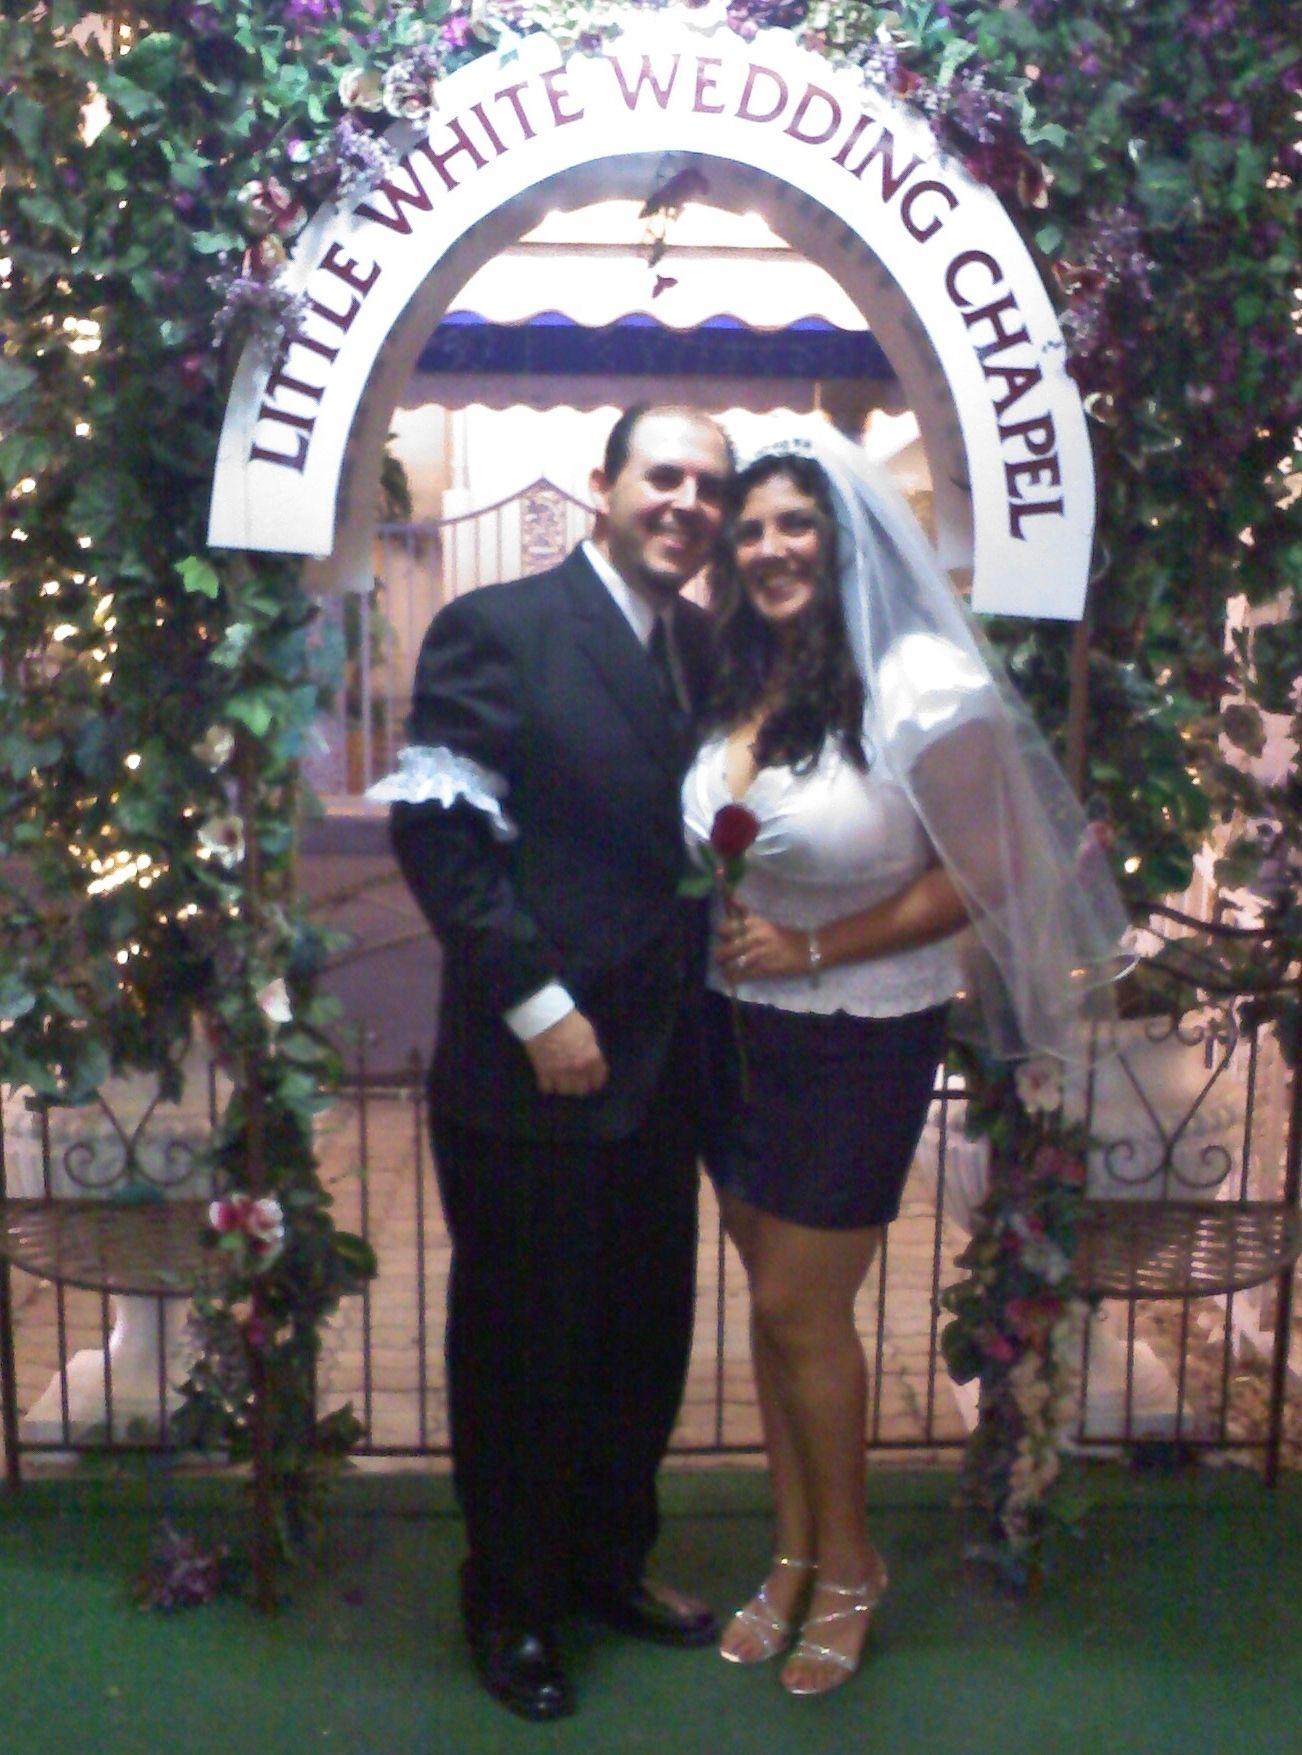 Famous Archway Little White Wedding Chapel 3 Elope Vow Renewal Marriage Vegas Las Vegas Marriage Wedding Renewal Vows Elope Wedding